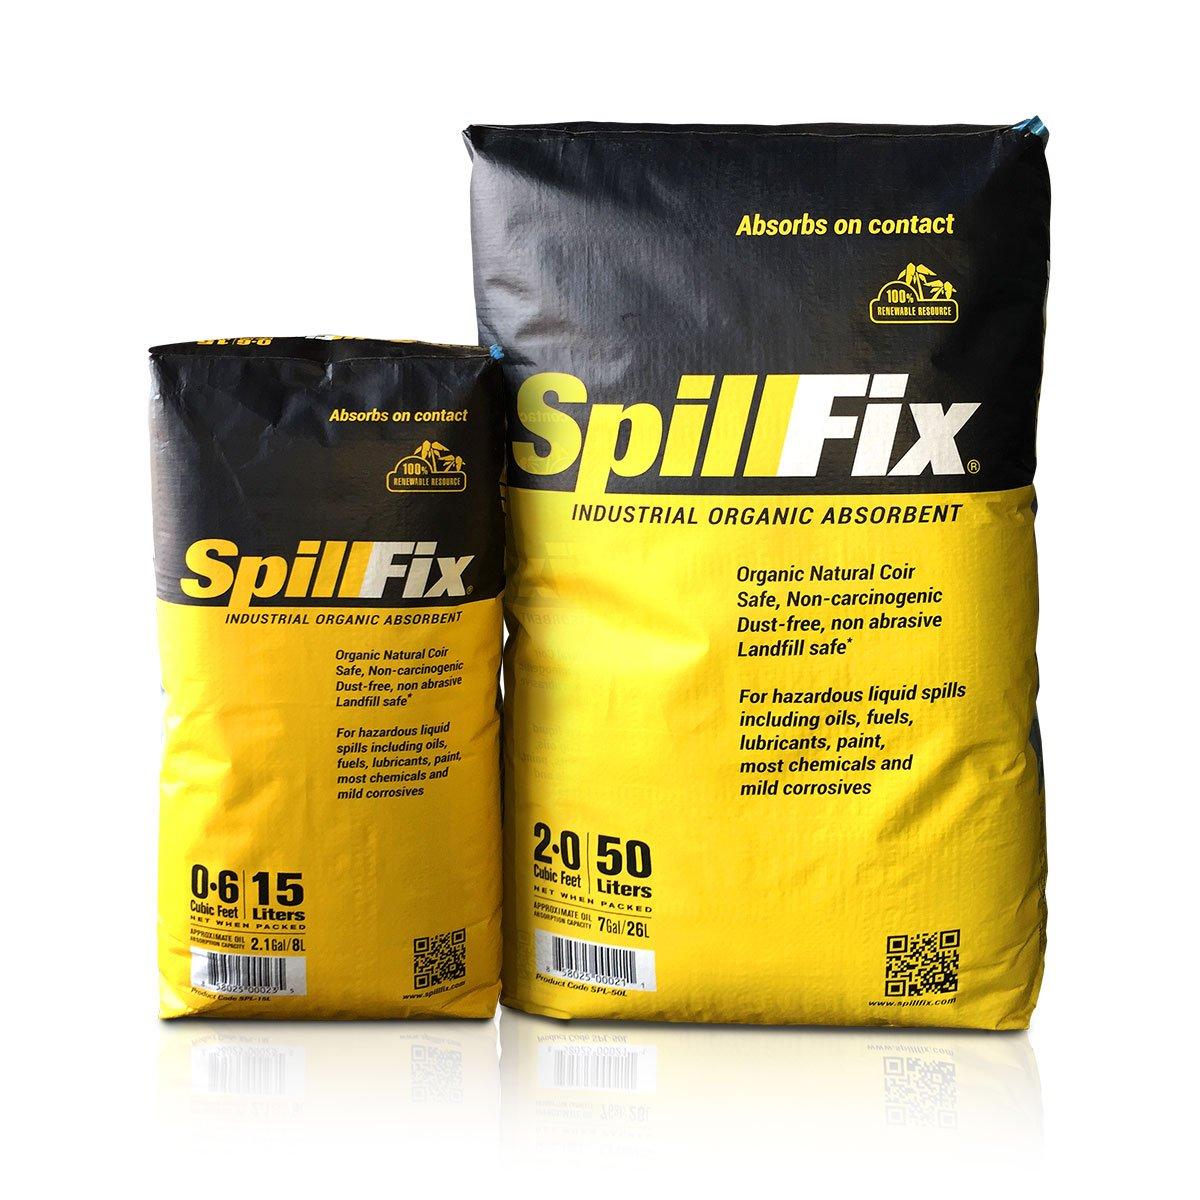 Spillfix Granular Absorbents